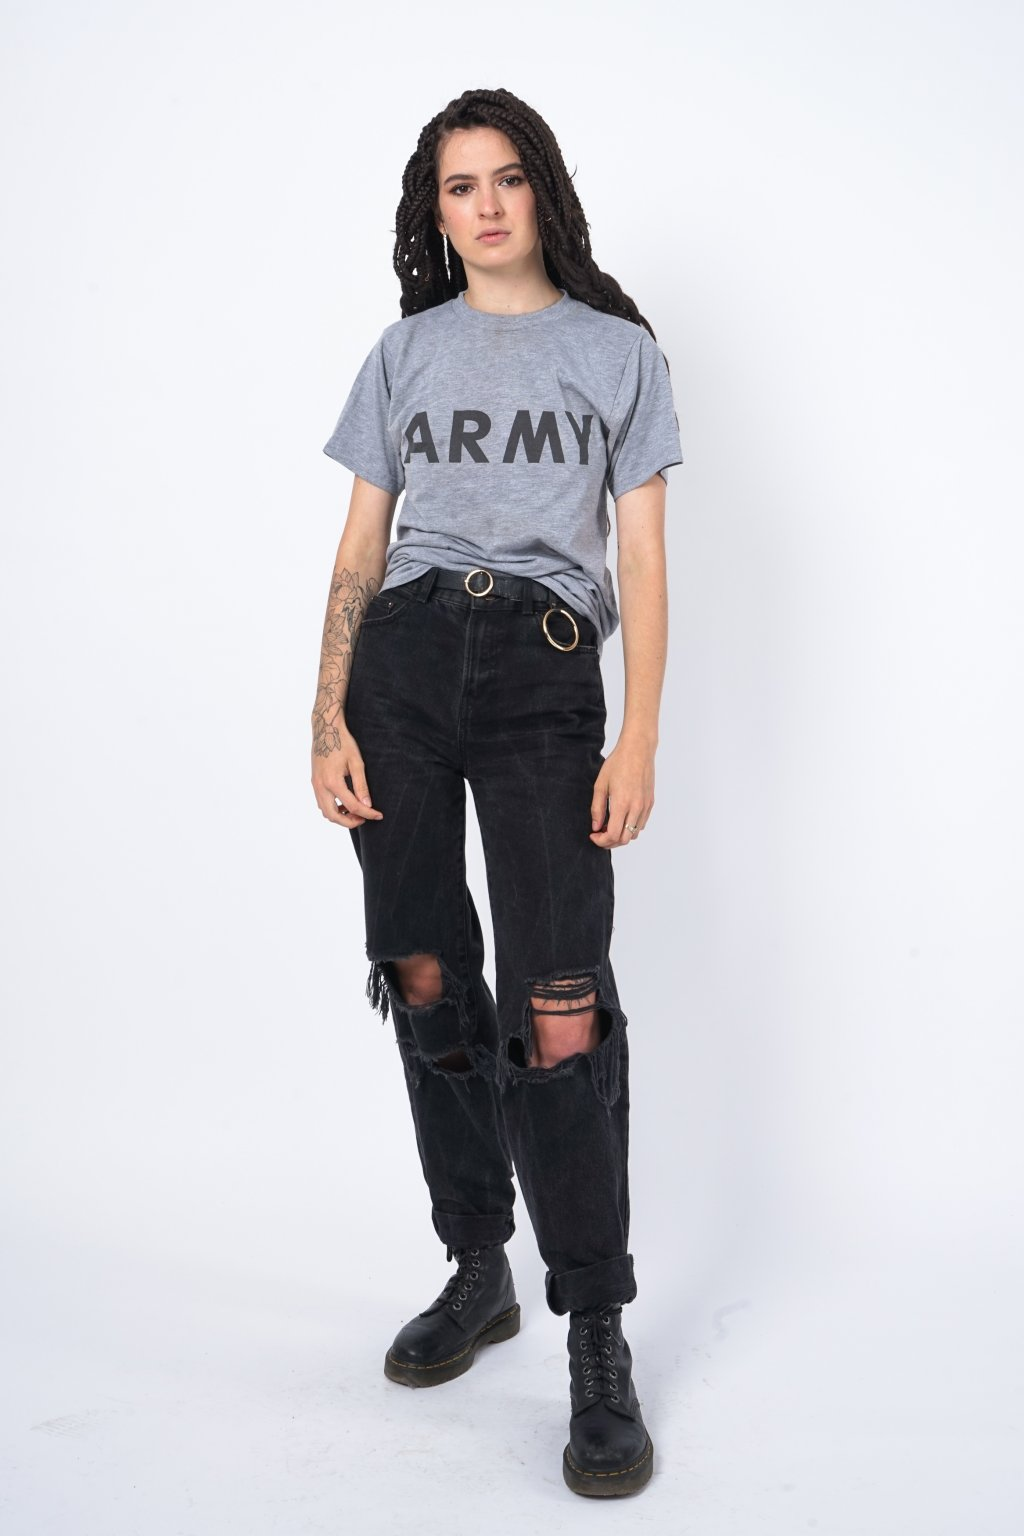 Army triko